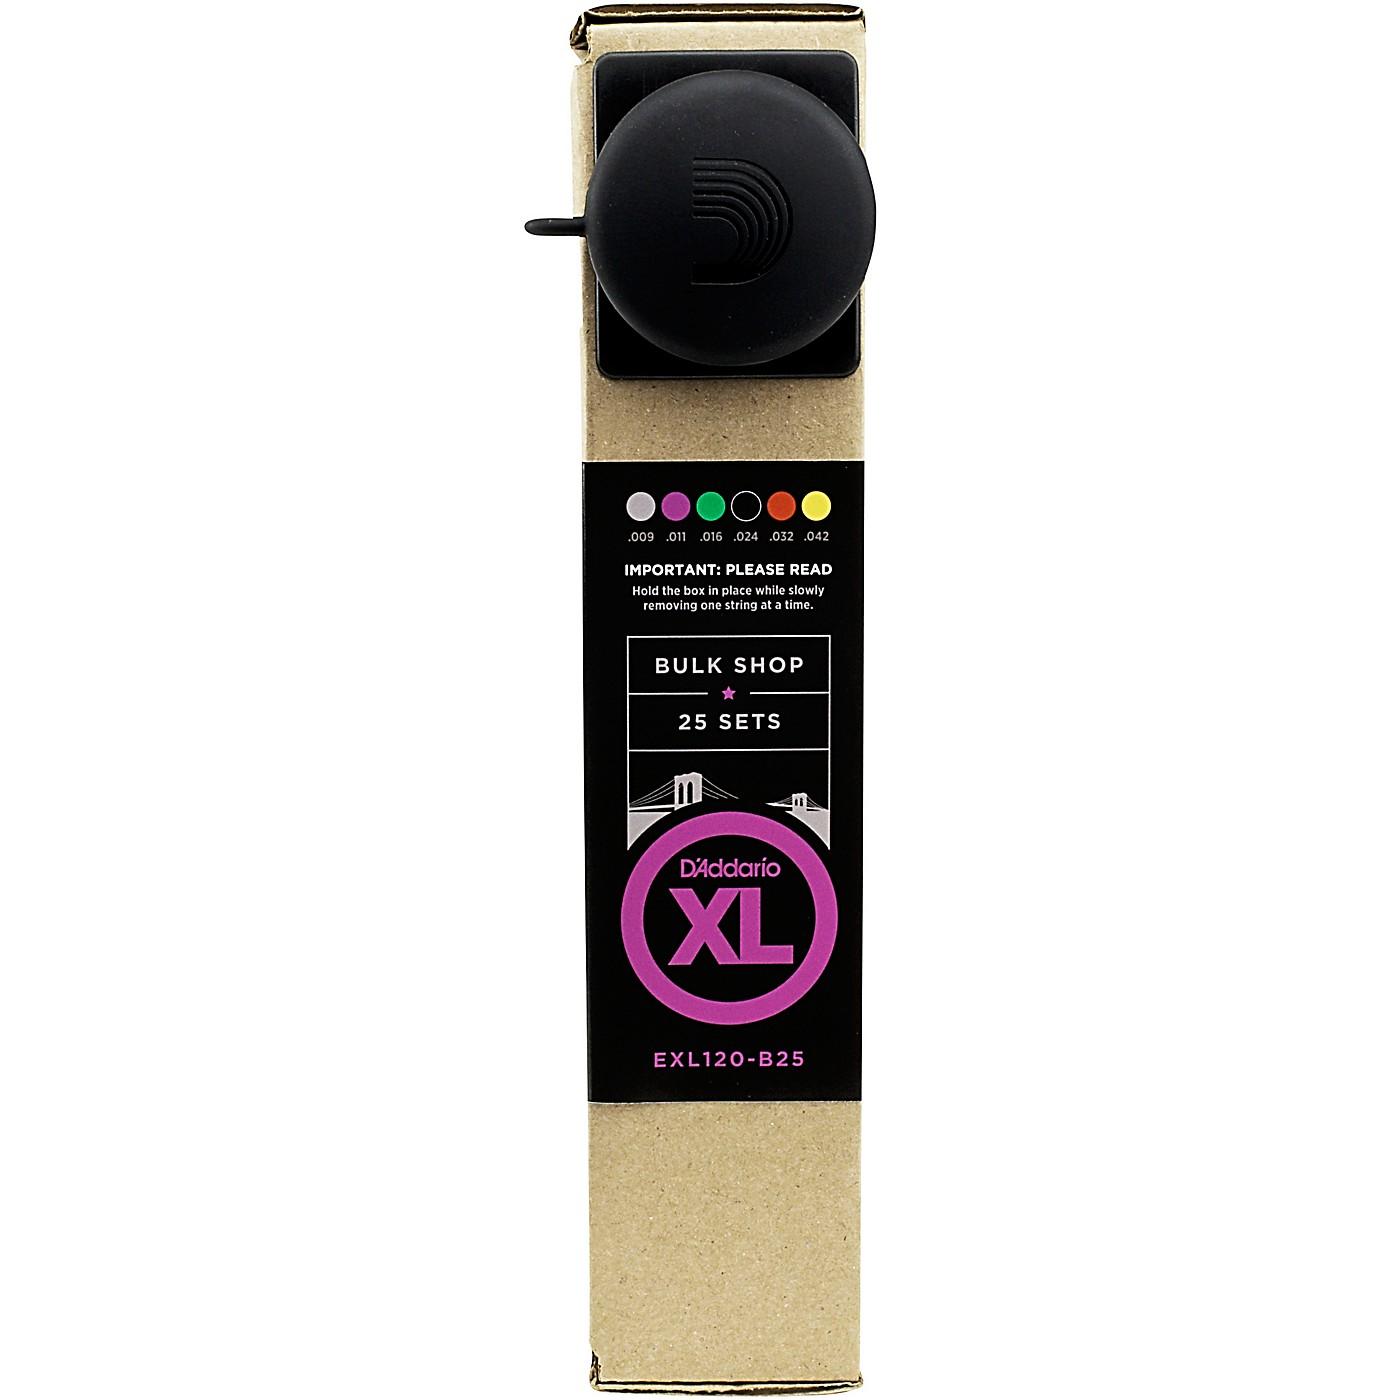 D'Addario EXL120 Guitar Strings Bulk -Pack Super Light  25 Sets thumbnail